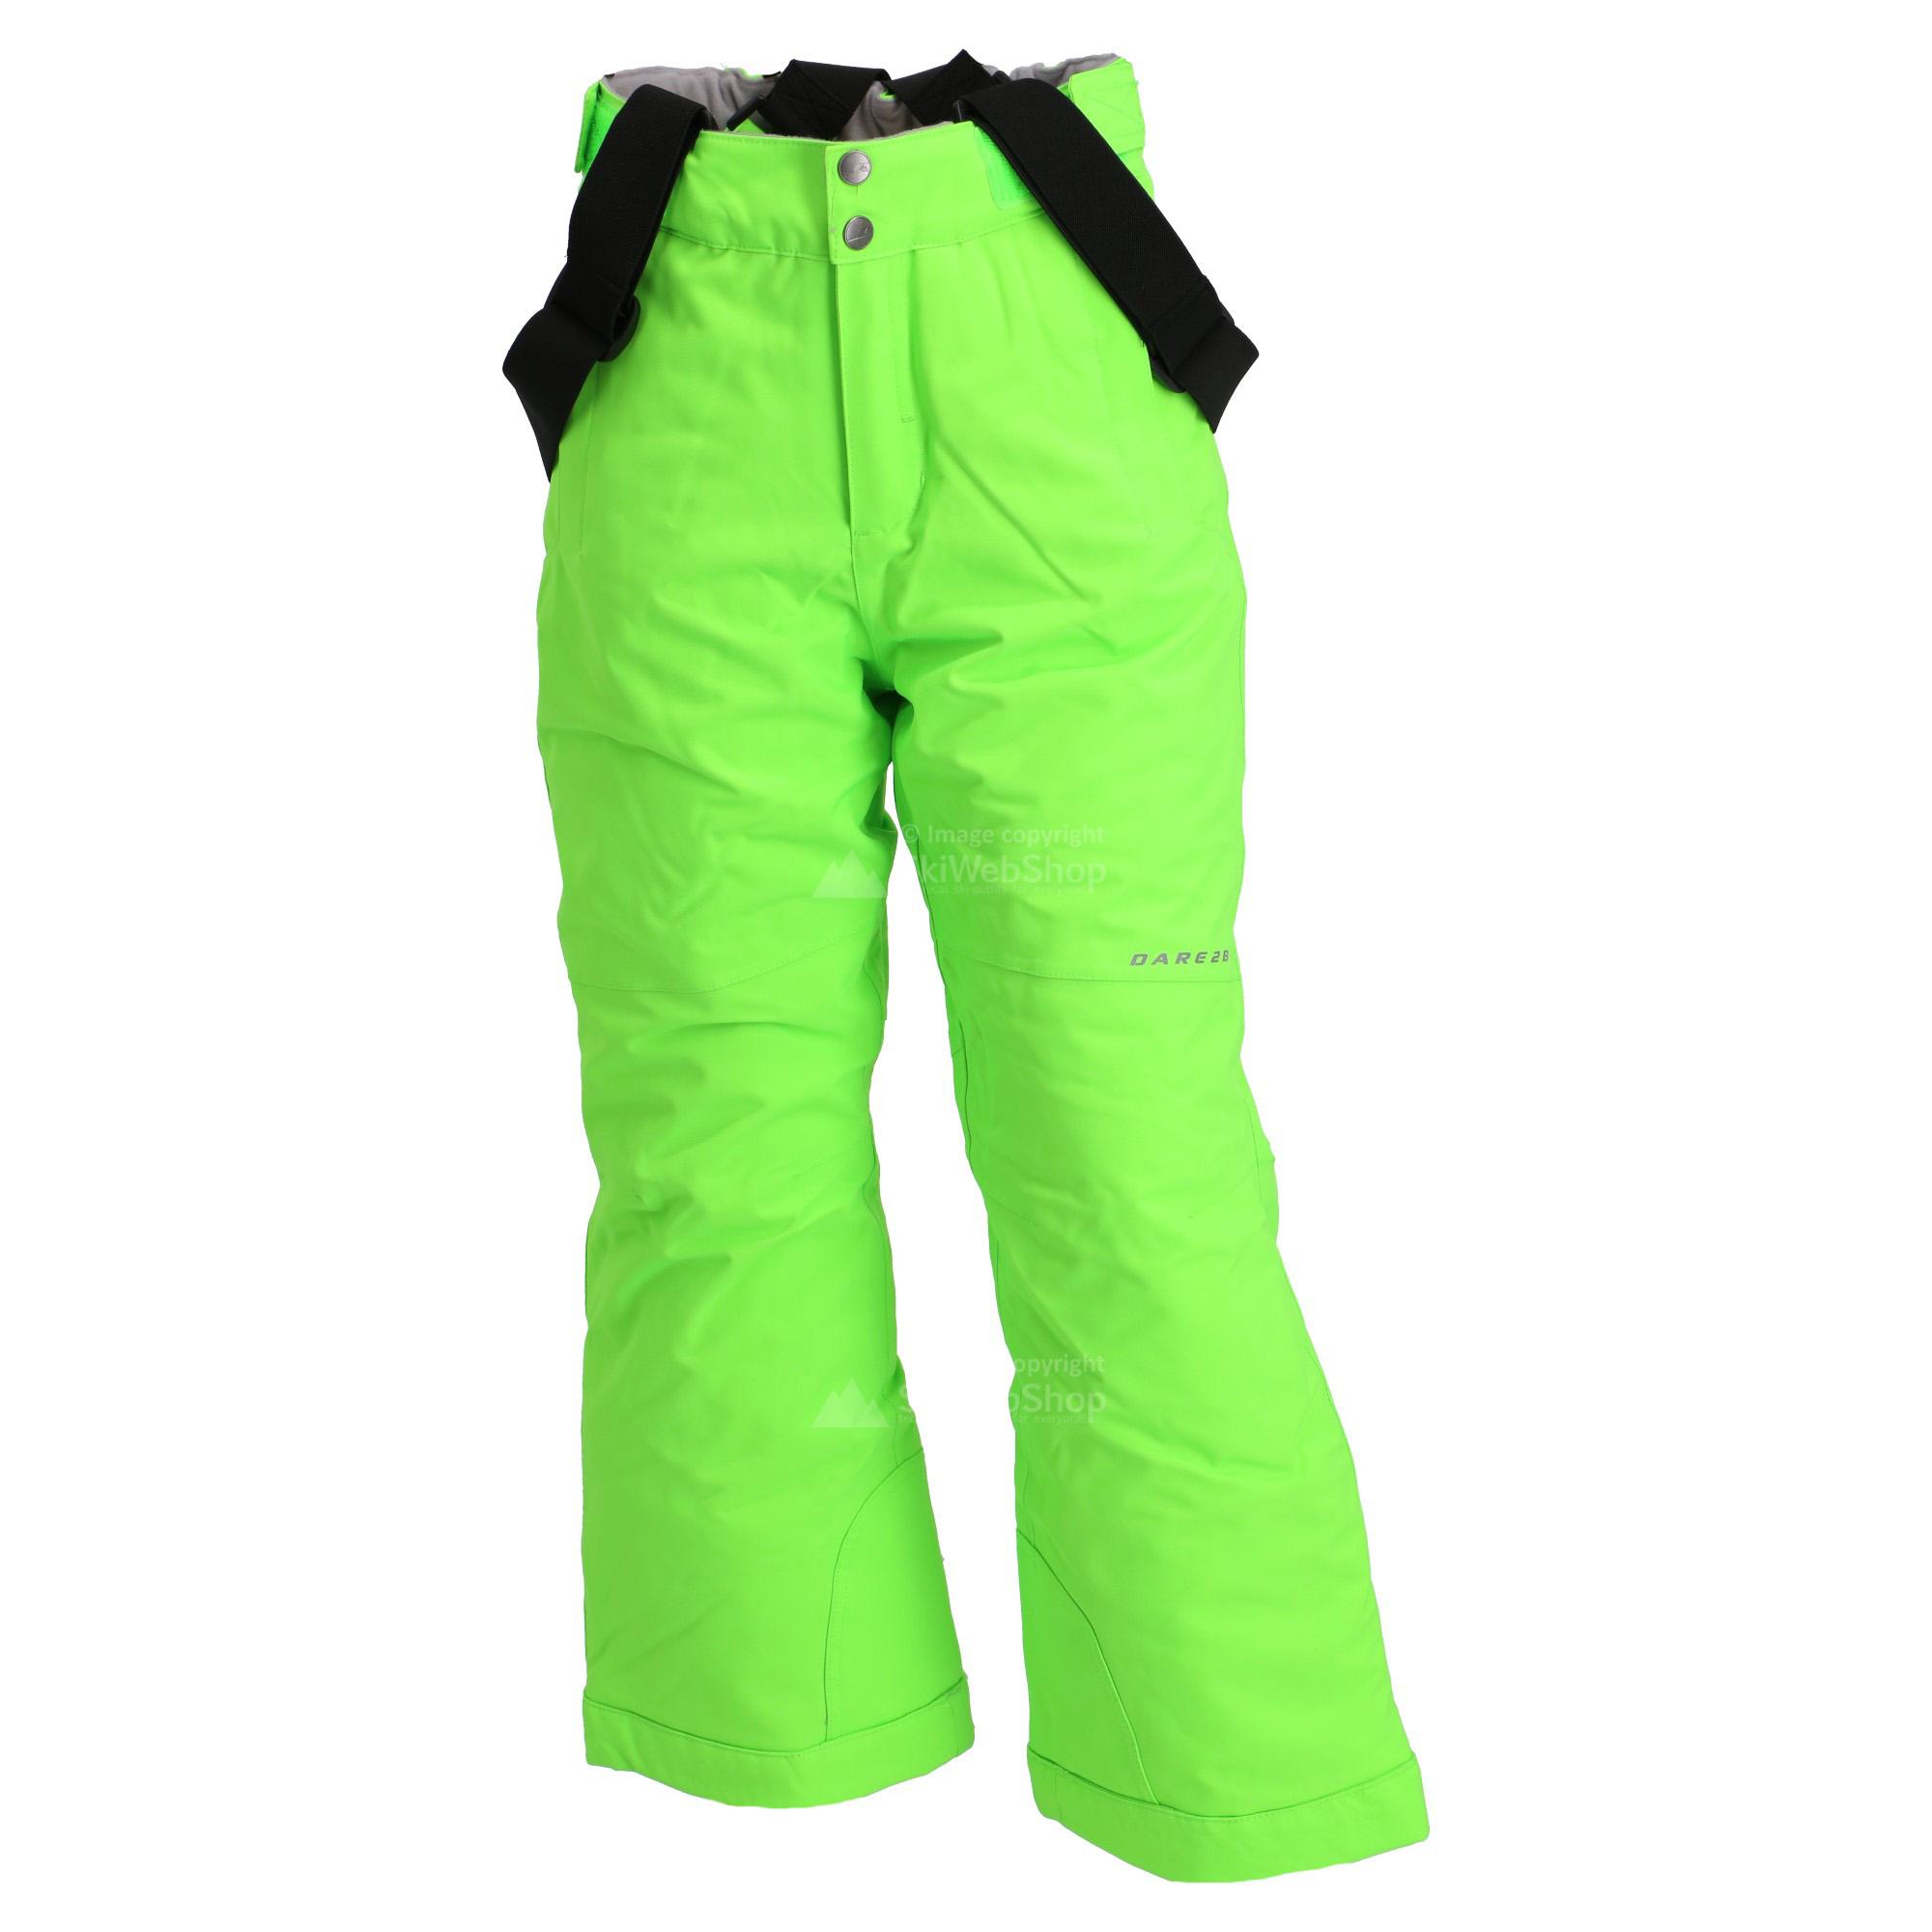 7a7ea0d69e6872 Dare2b, Take On, skibroek, kinderen, neon green